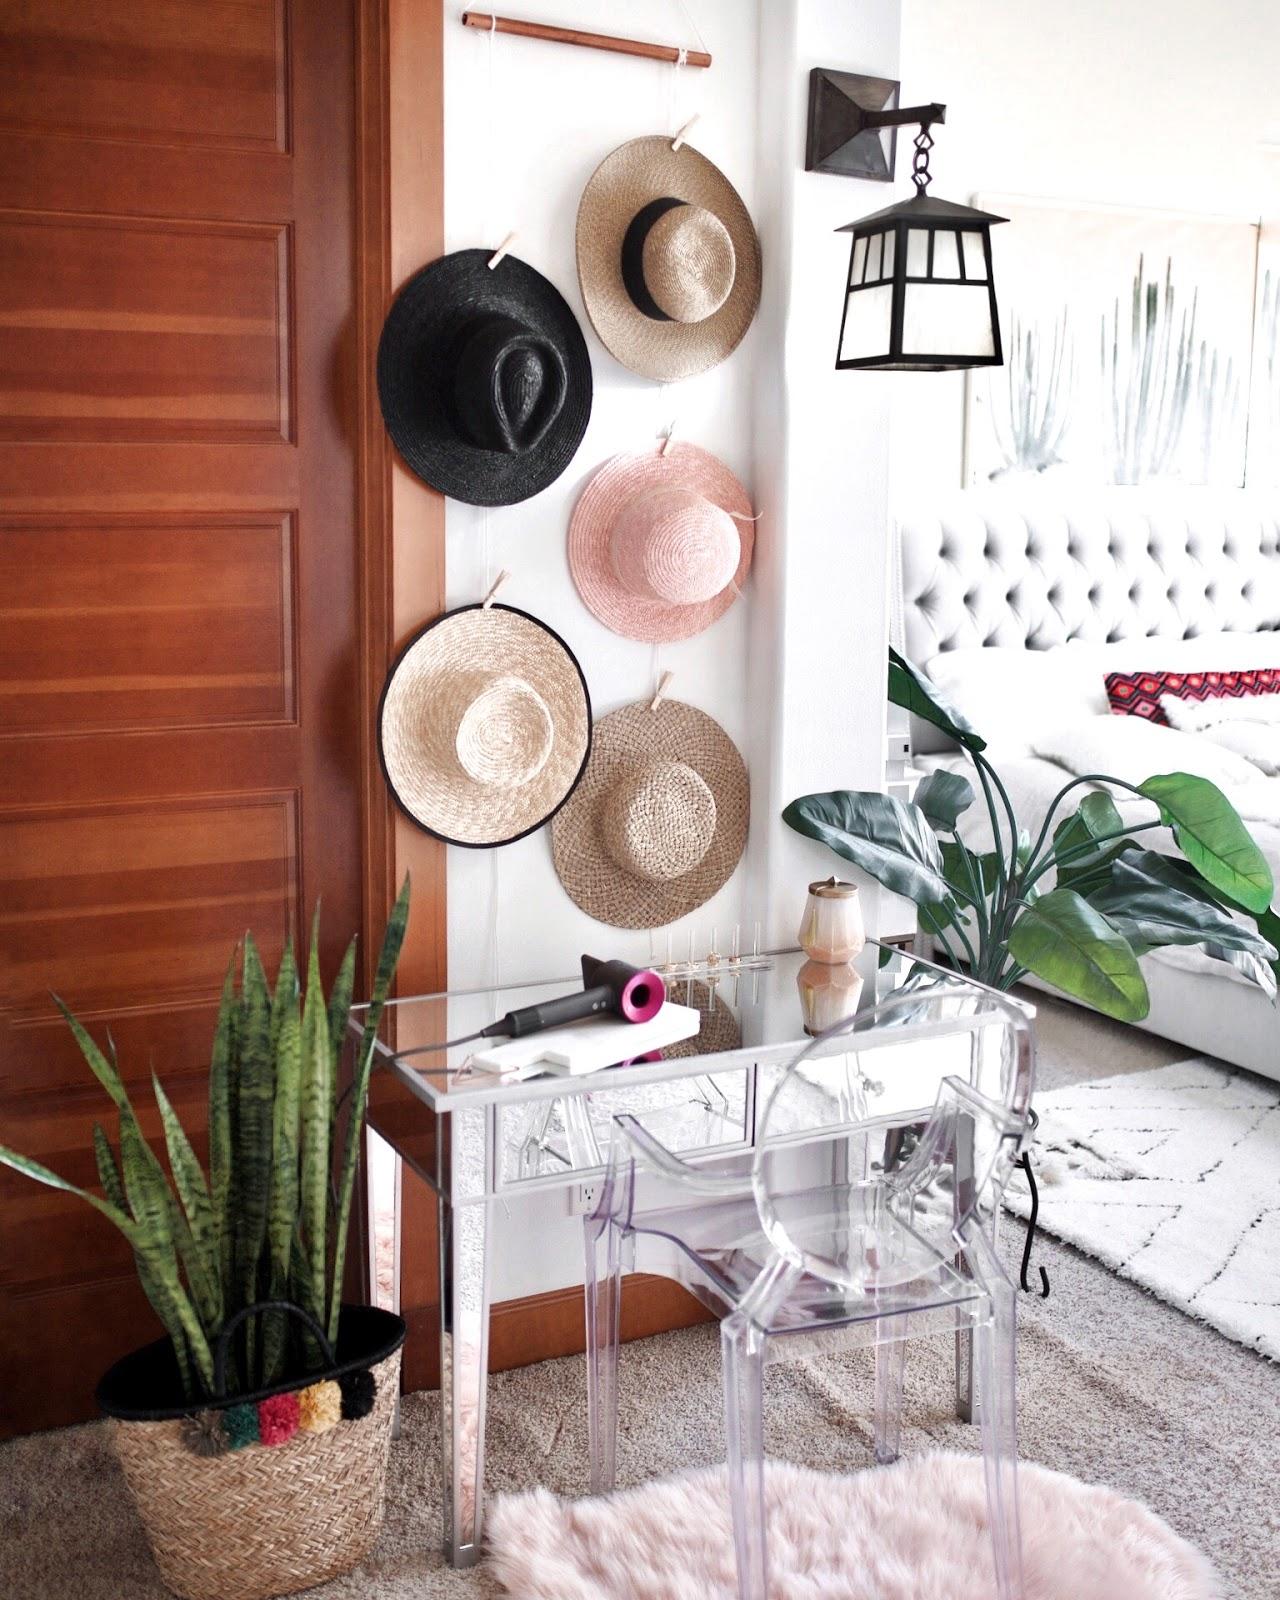 DIY hat wall display